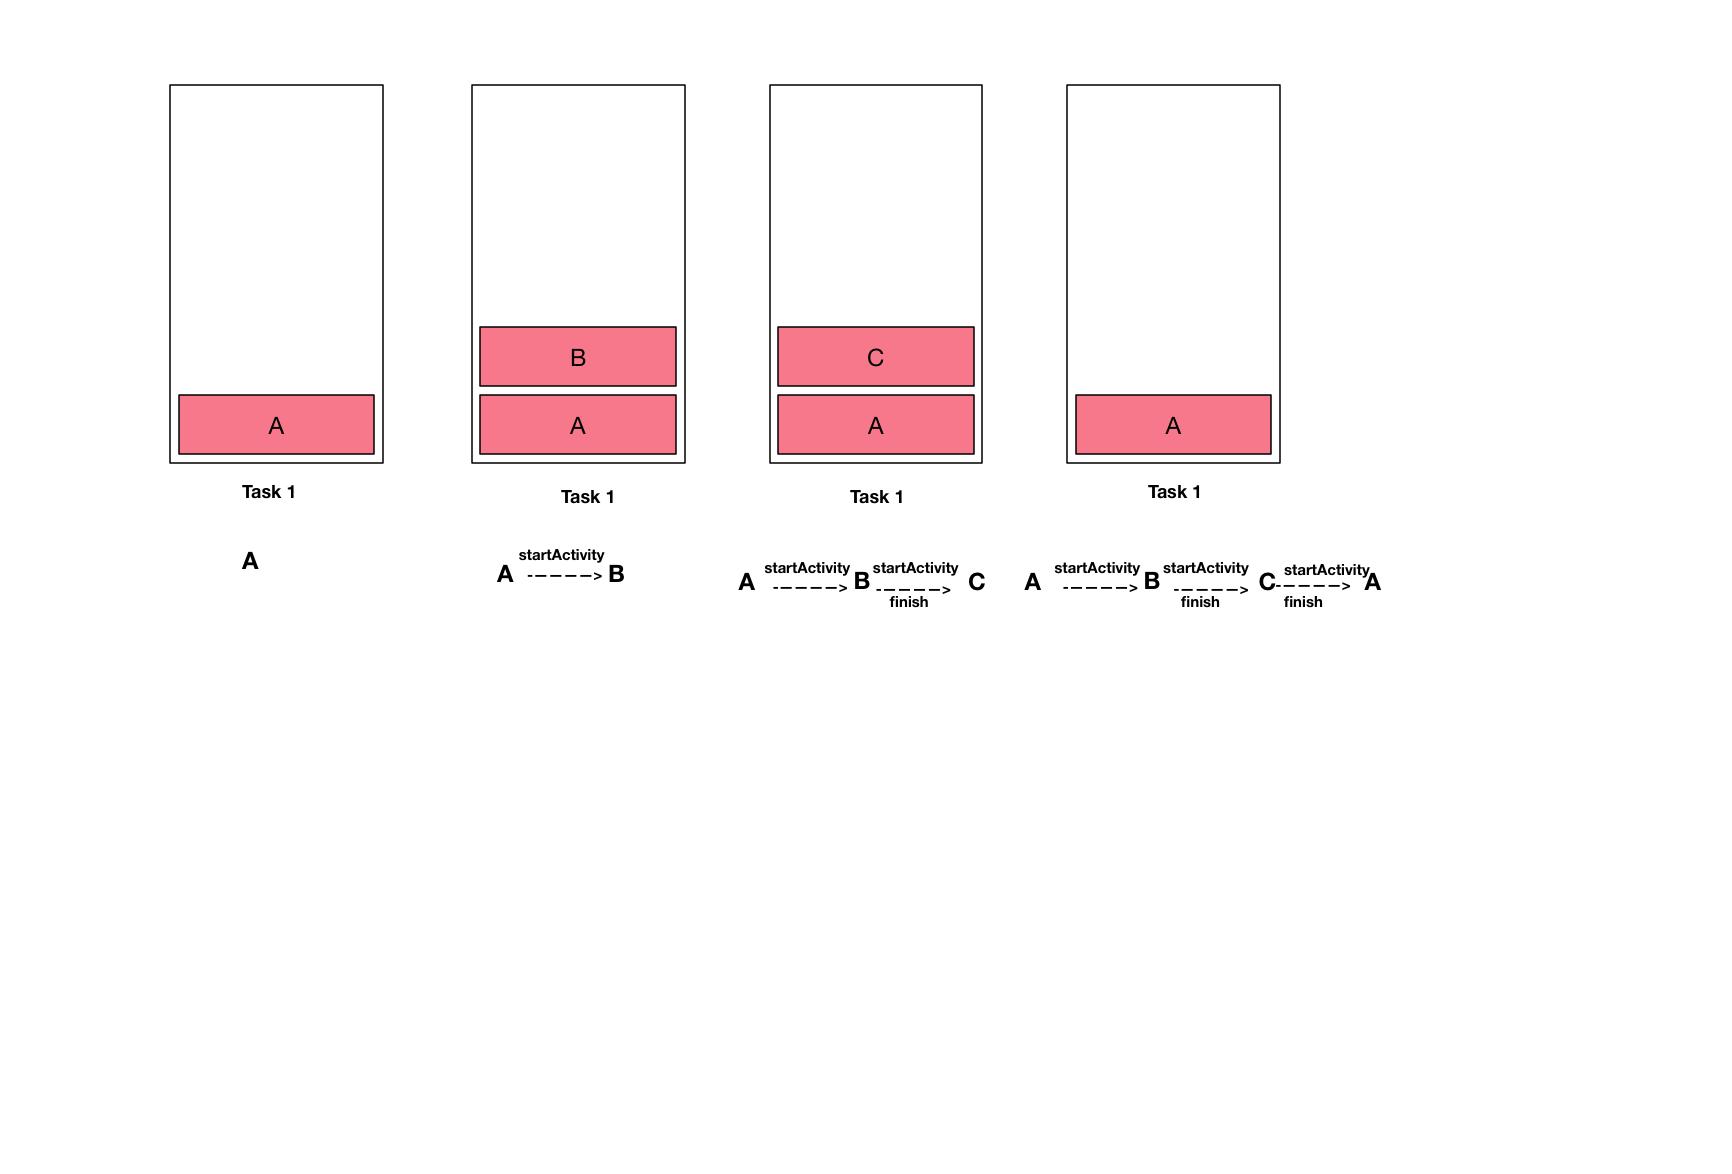 singleTop launchMode2